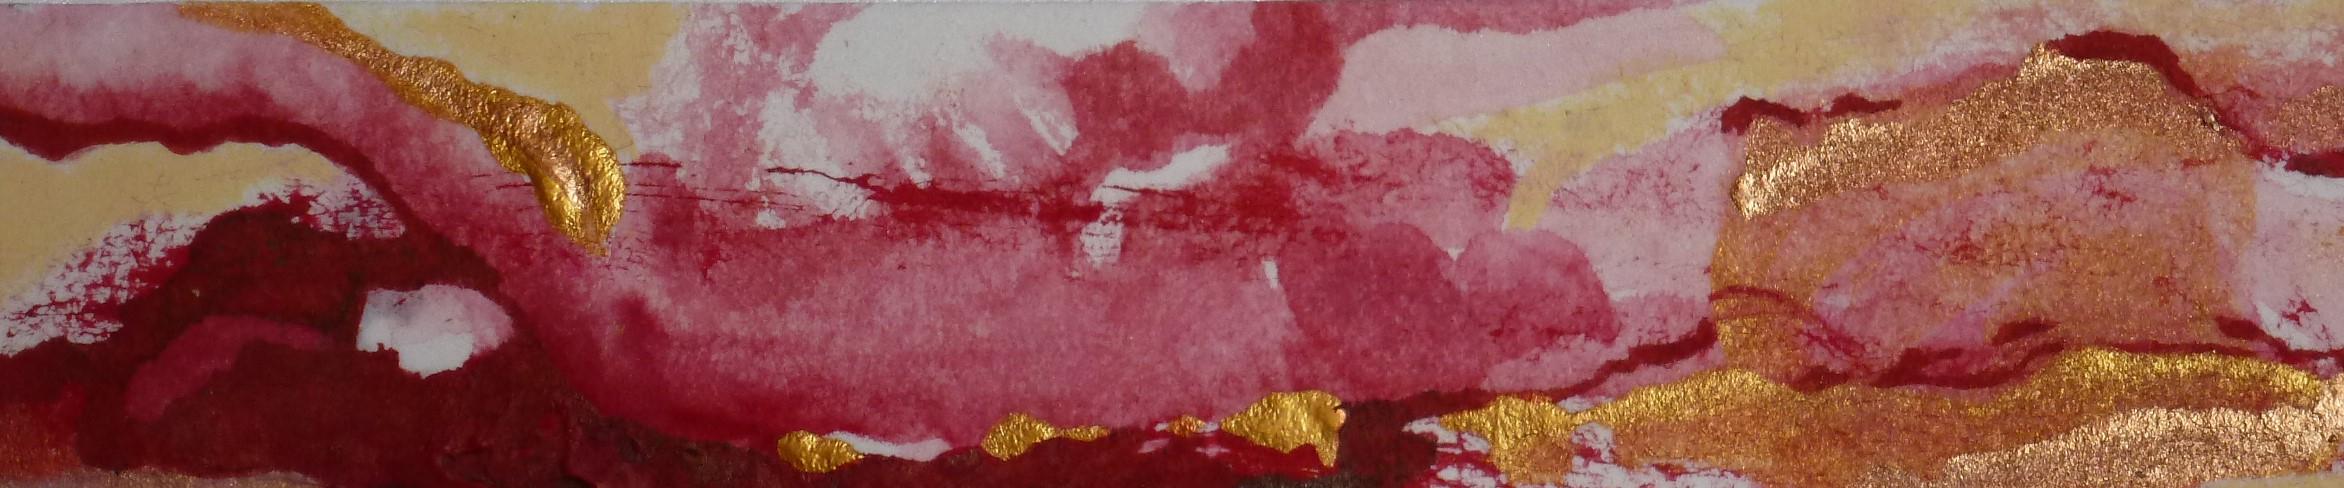 Annick GILLOT - Artiste Peintre